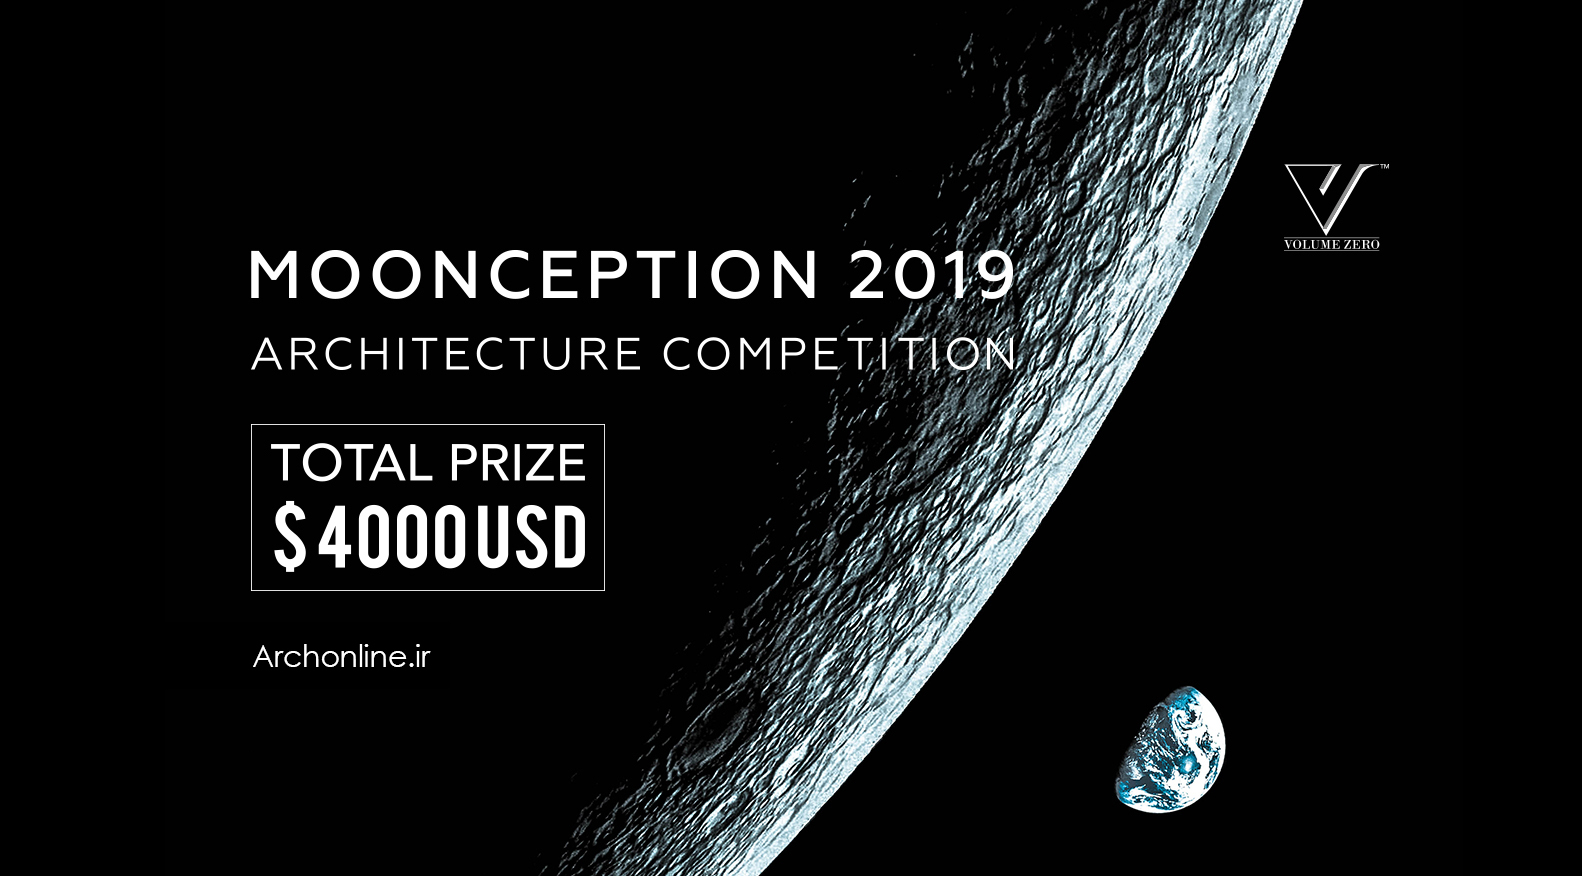 فراخوان رقابت معماری Moonception 2019